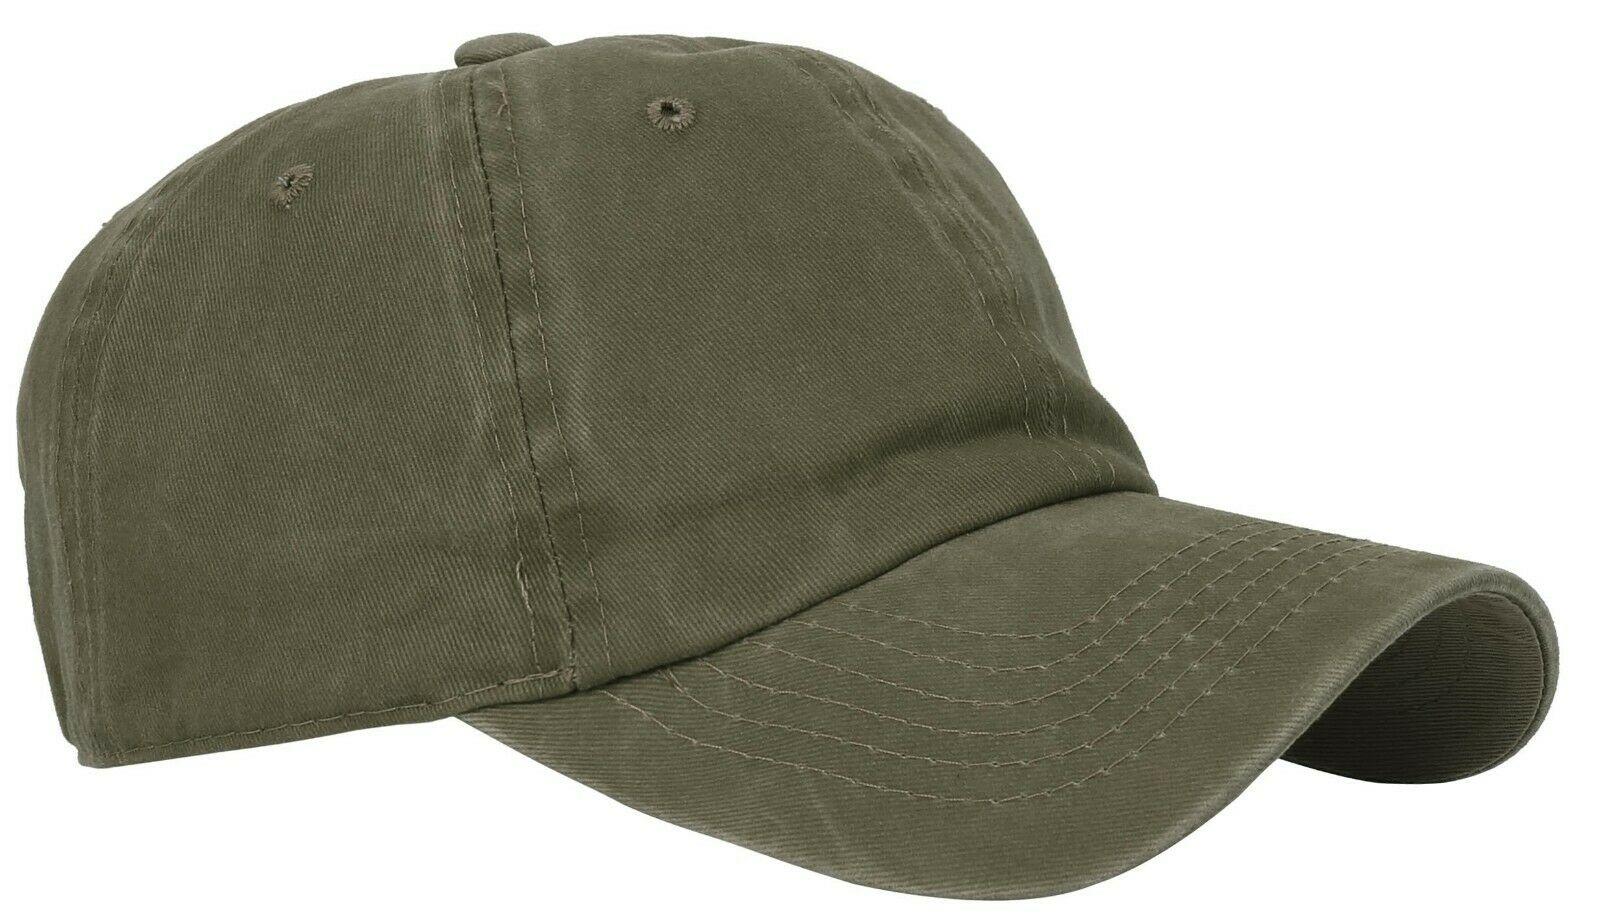 BASEBALL-CAP-Plain-Dad-Hat-Low-Profile-Vintage-Washed-Pigment-Adjustable thumbnail 7